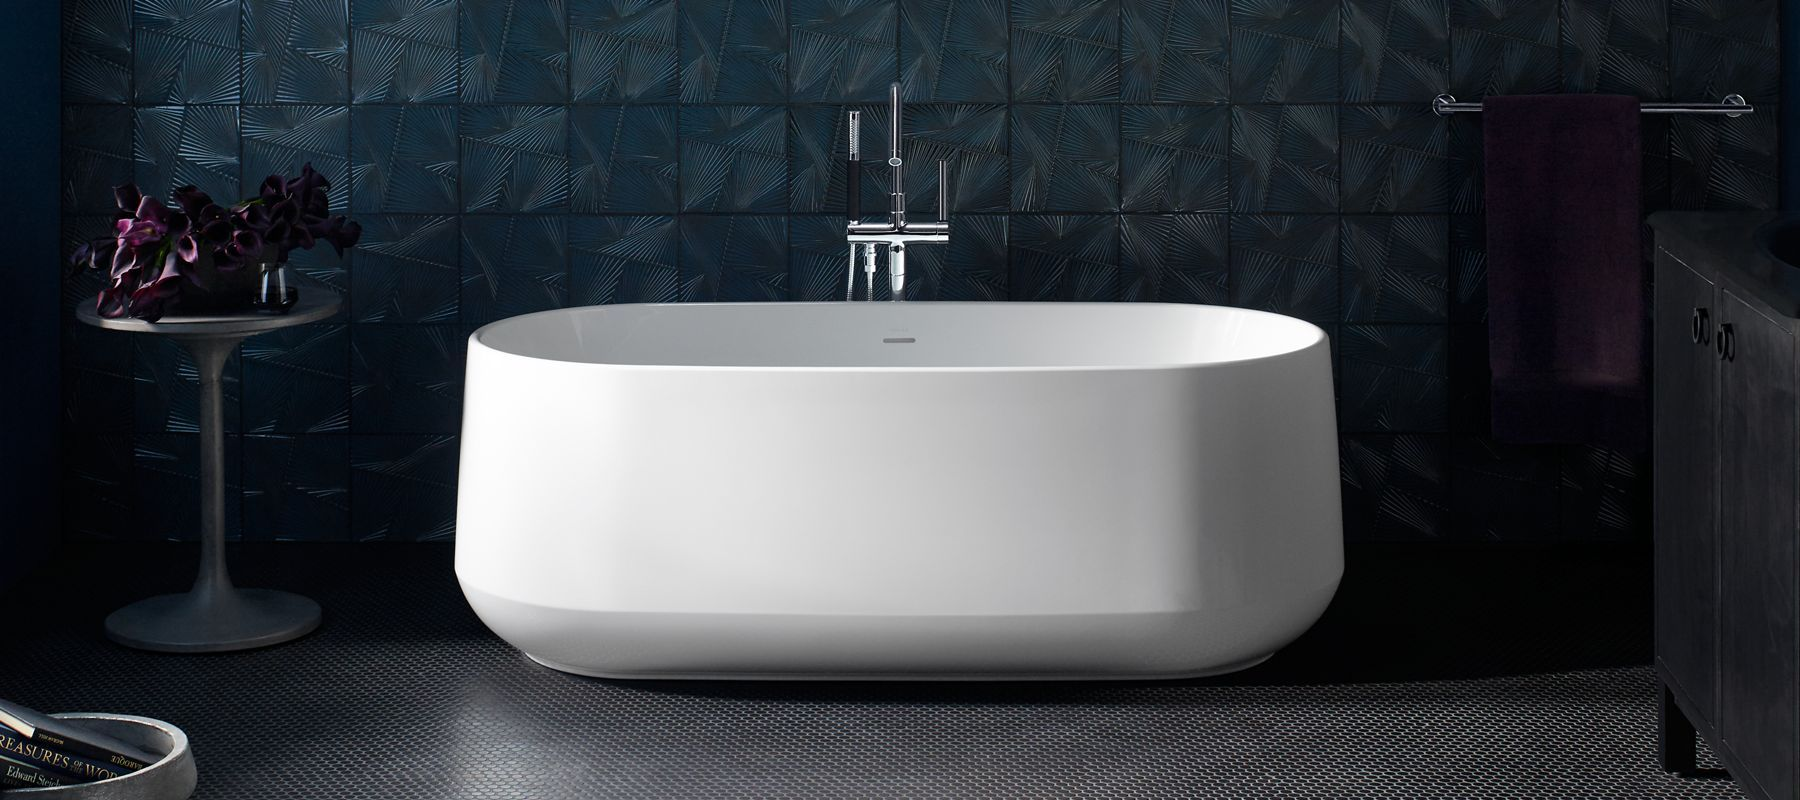 BubbleMassage Air Baths Bathtubs, Whirlpool, Bathing Products ...